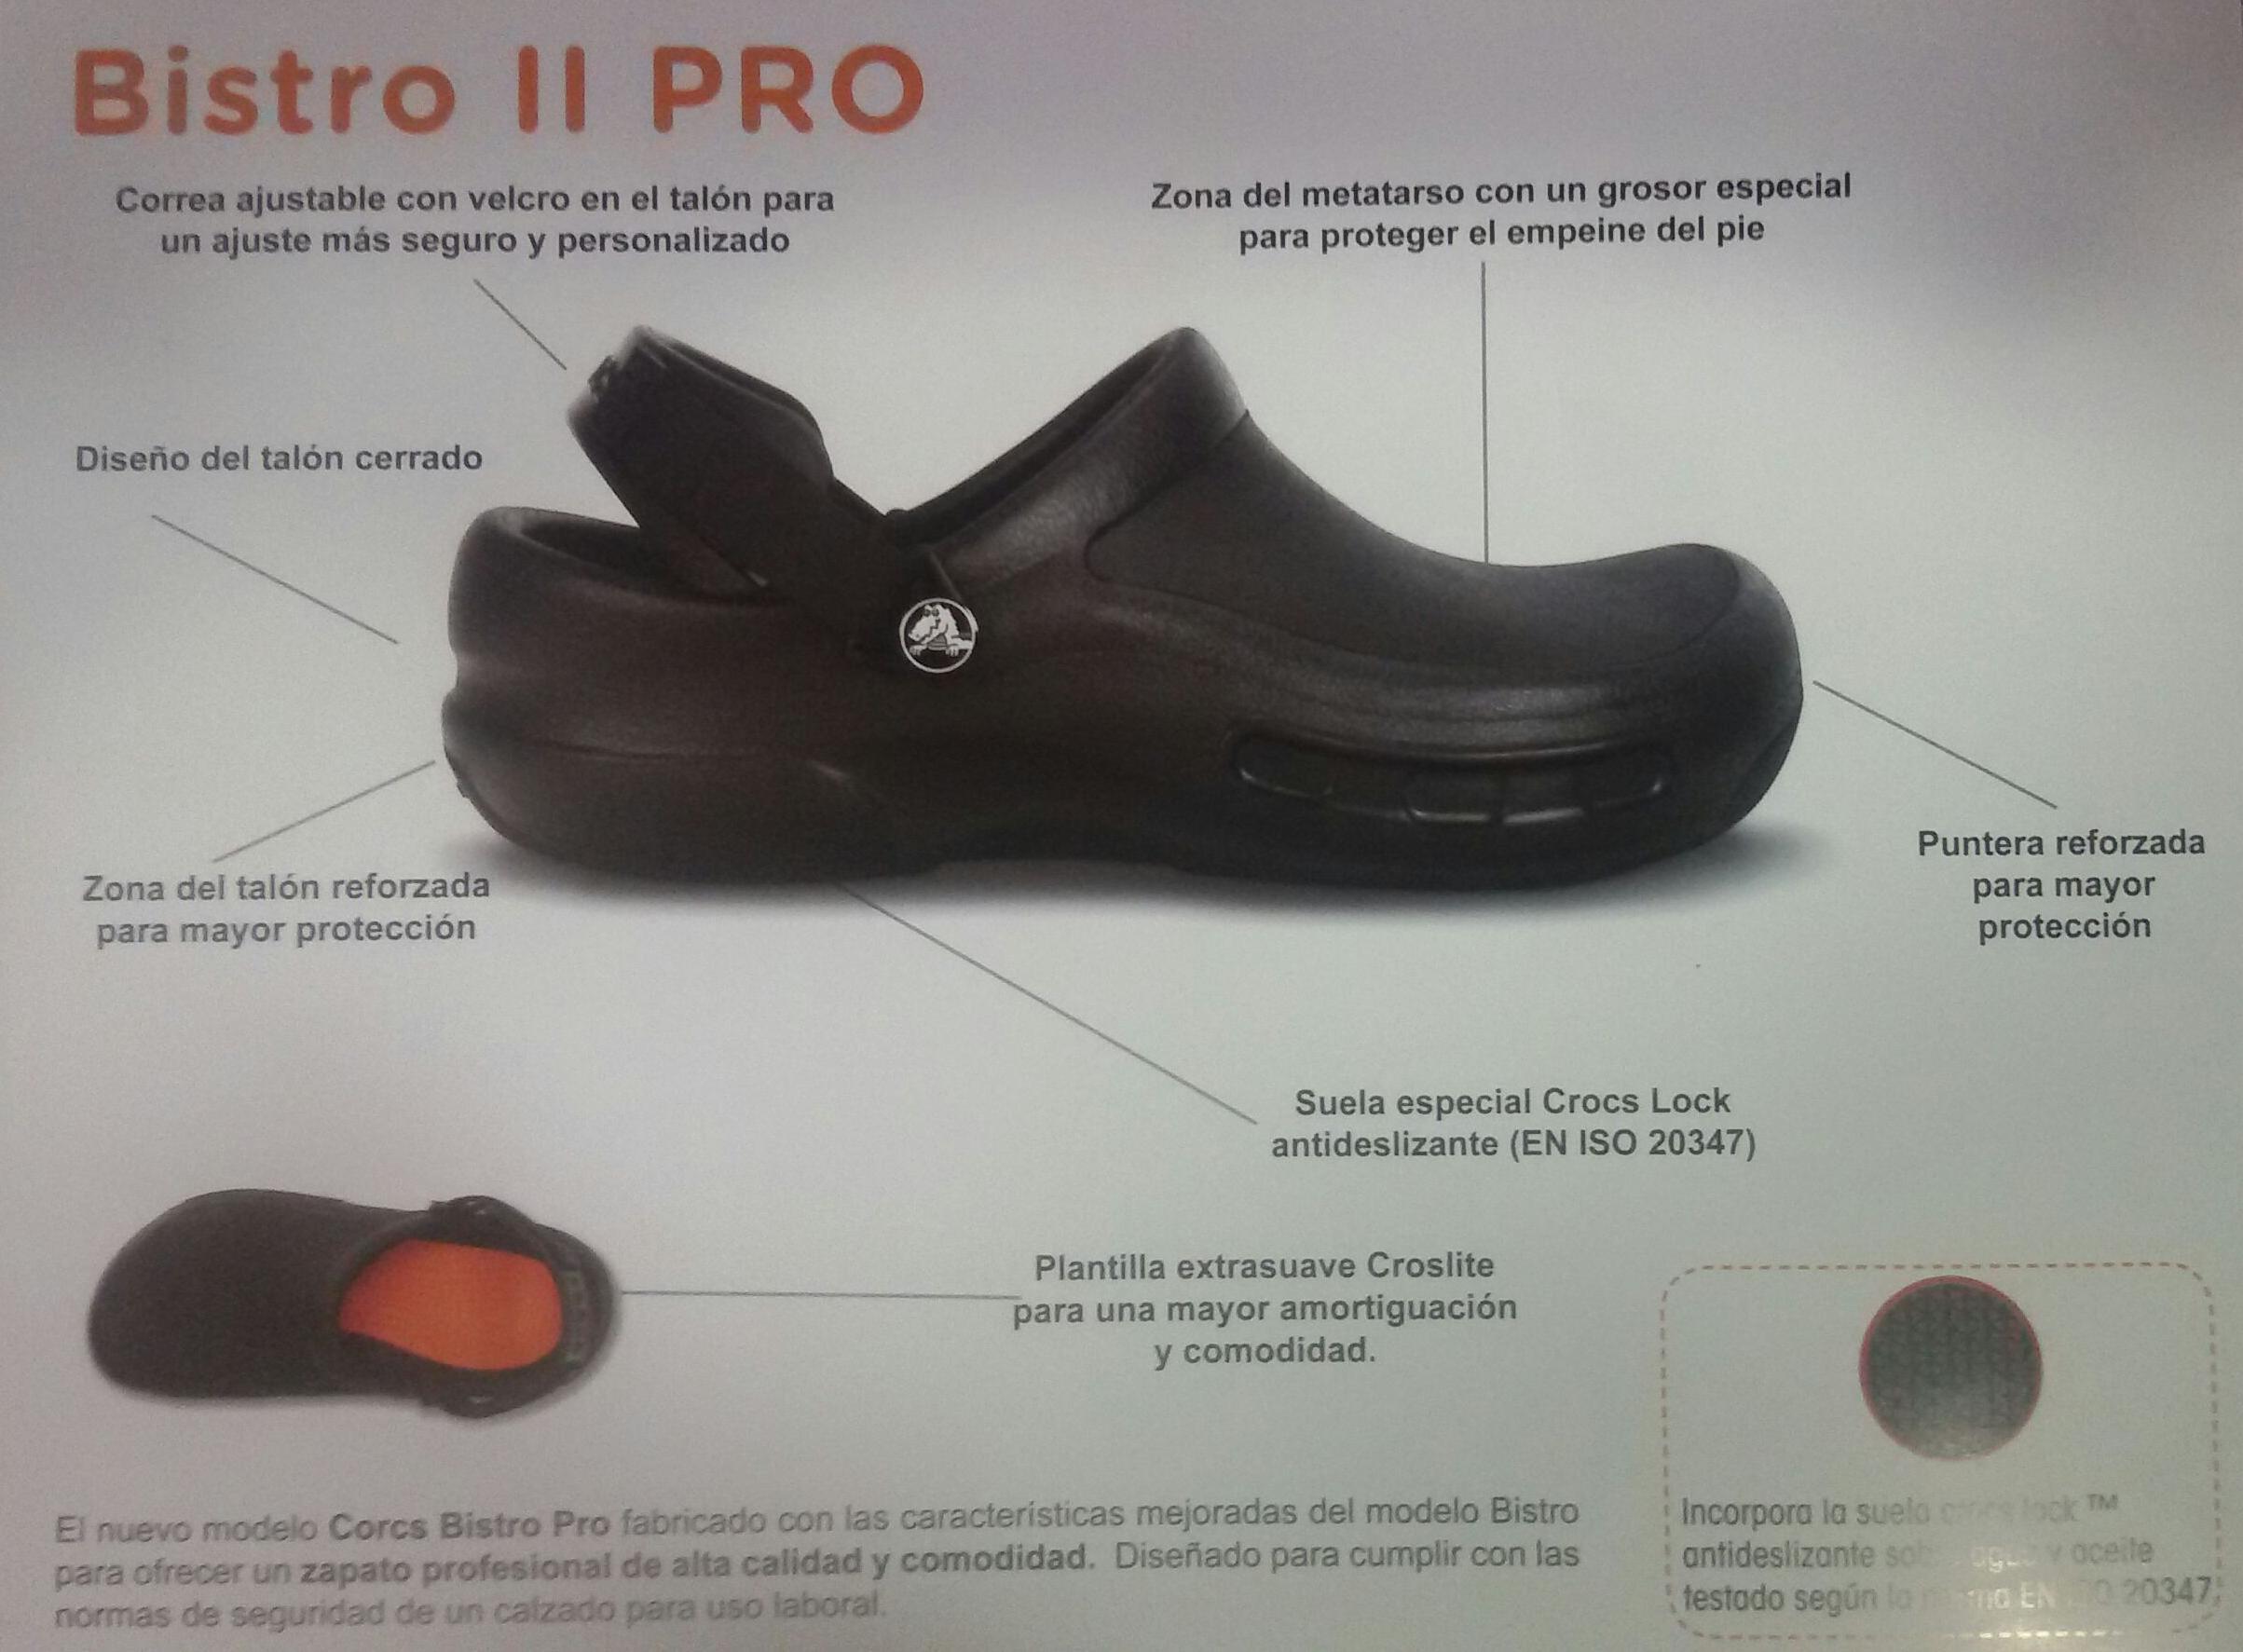 8876ec5bf Ropa Hosteleria Catalogo Trench Laboral Para Crocs De Zueco x11cwCSOq